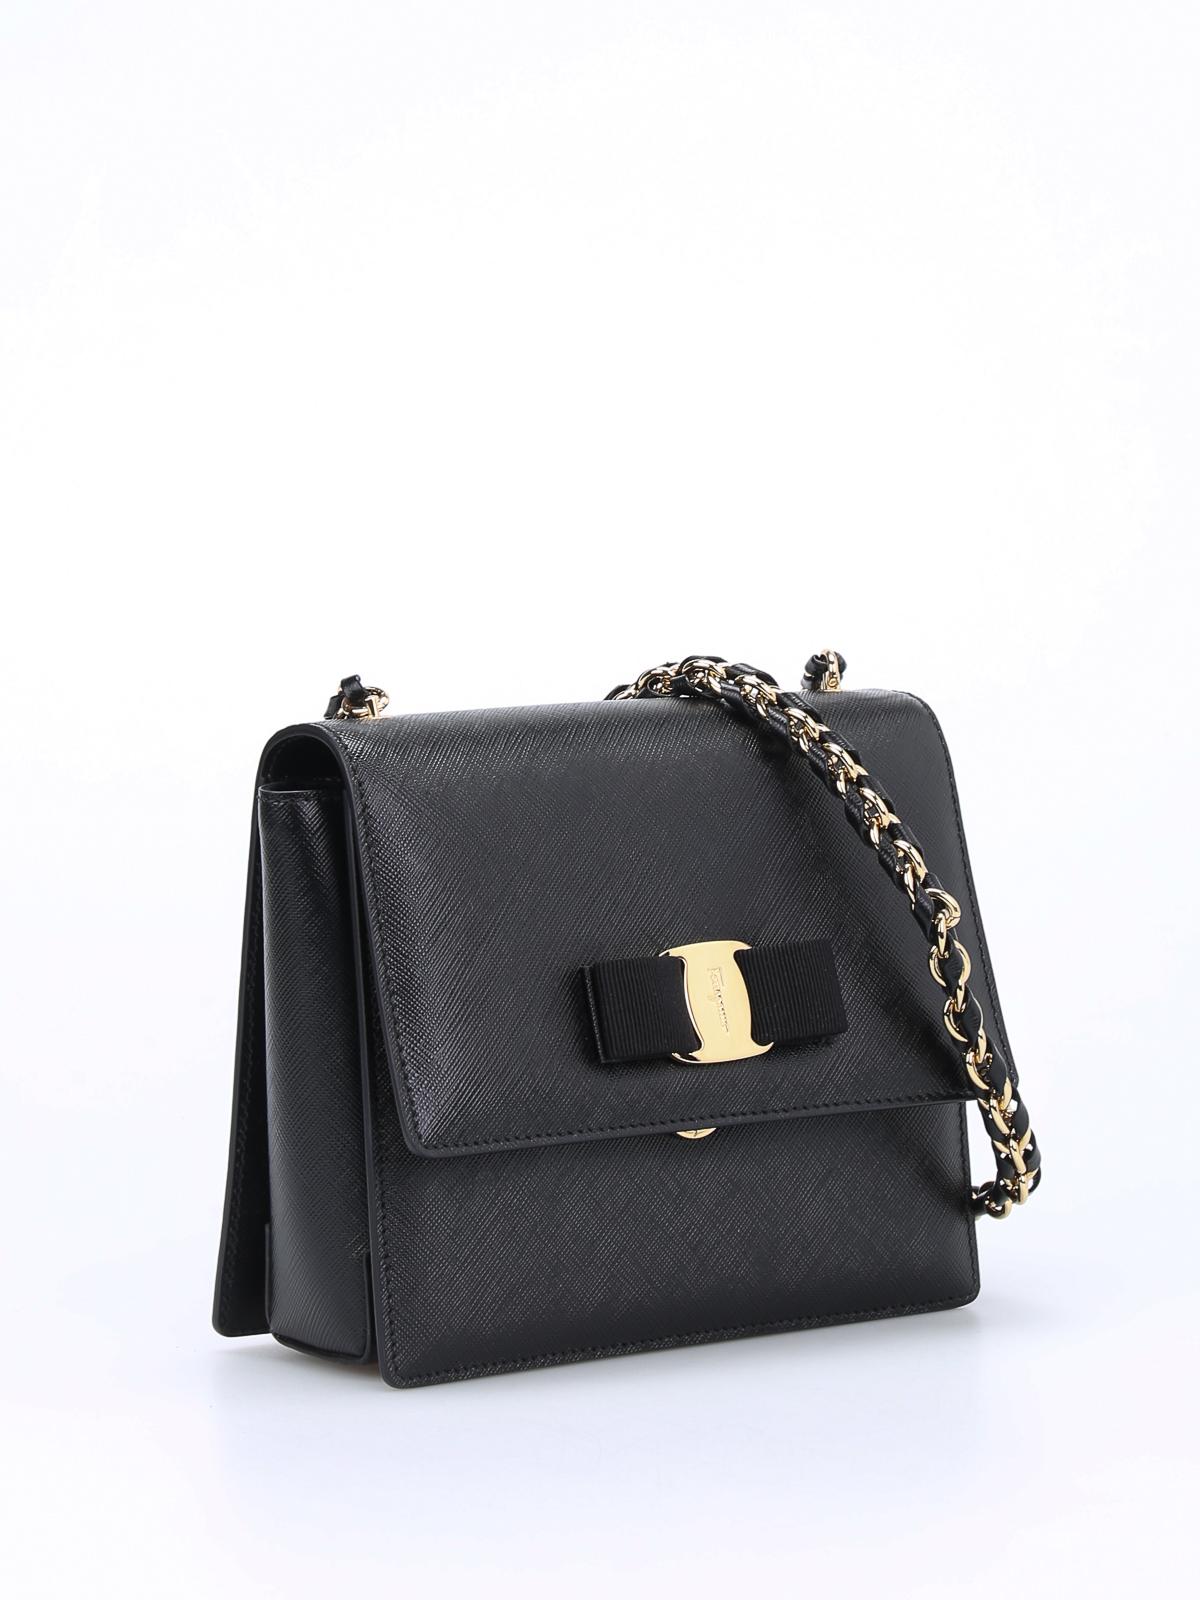 Salvatore Ferragamo Salvador Ferragamo Patent-leather Clutch/ Shoulder Bag vF59G9yjy